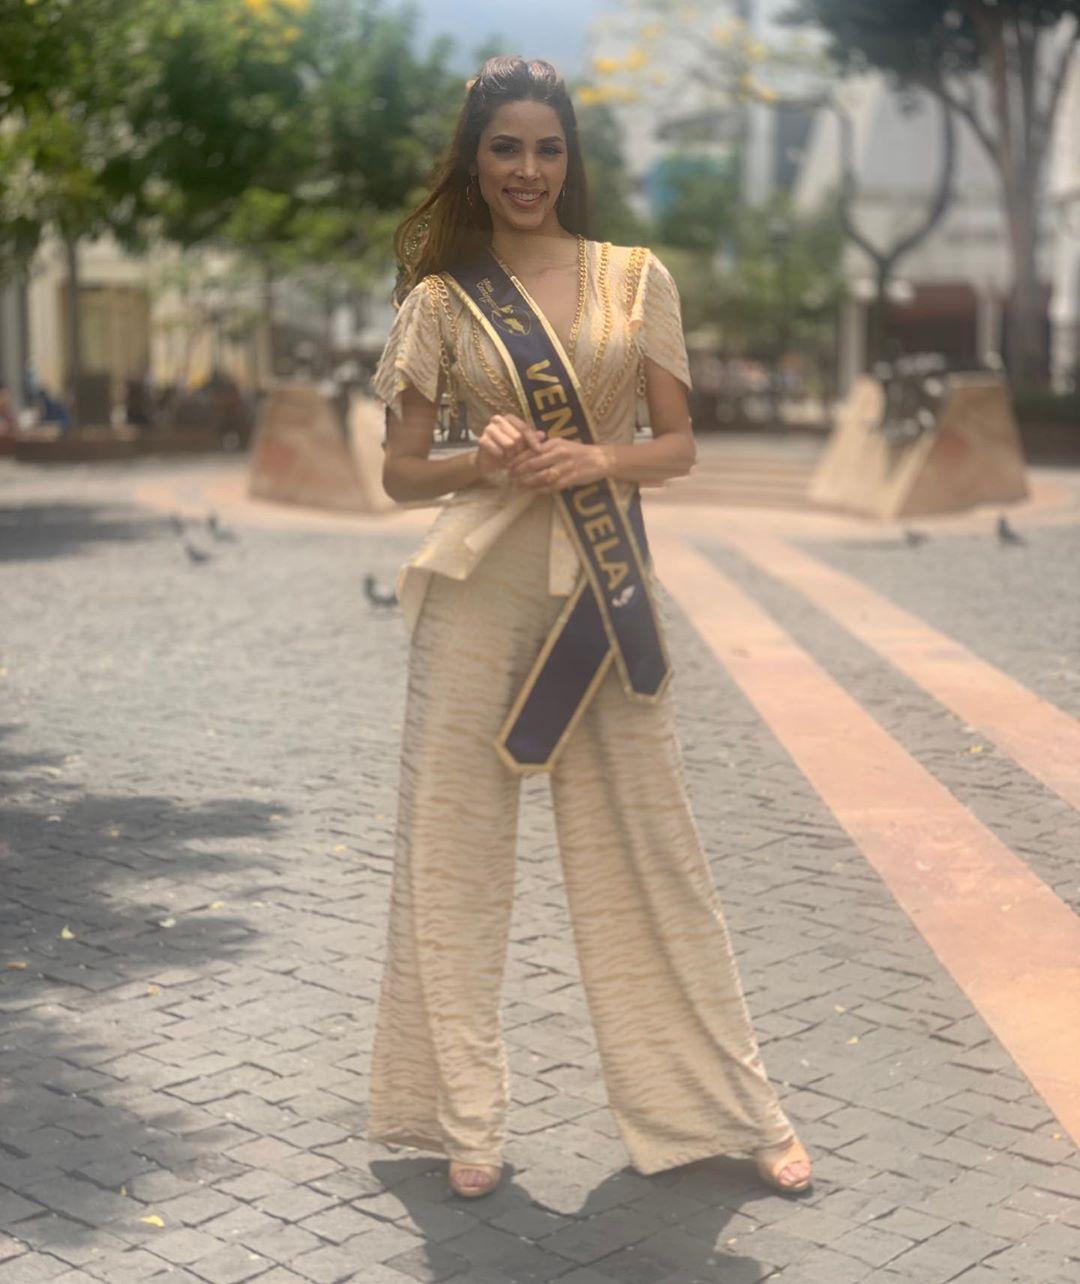 maria jose bracho, miss venezuela continentes unidos 2019. - Página 5 72314310